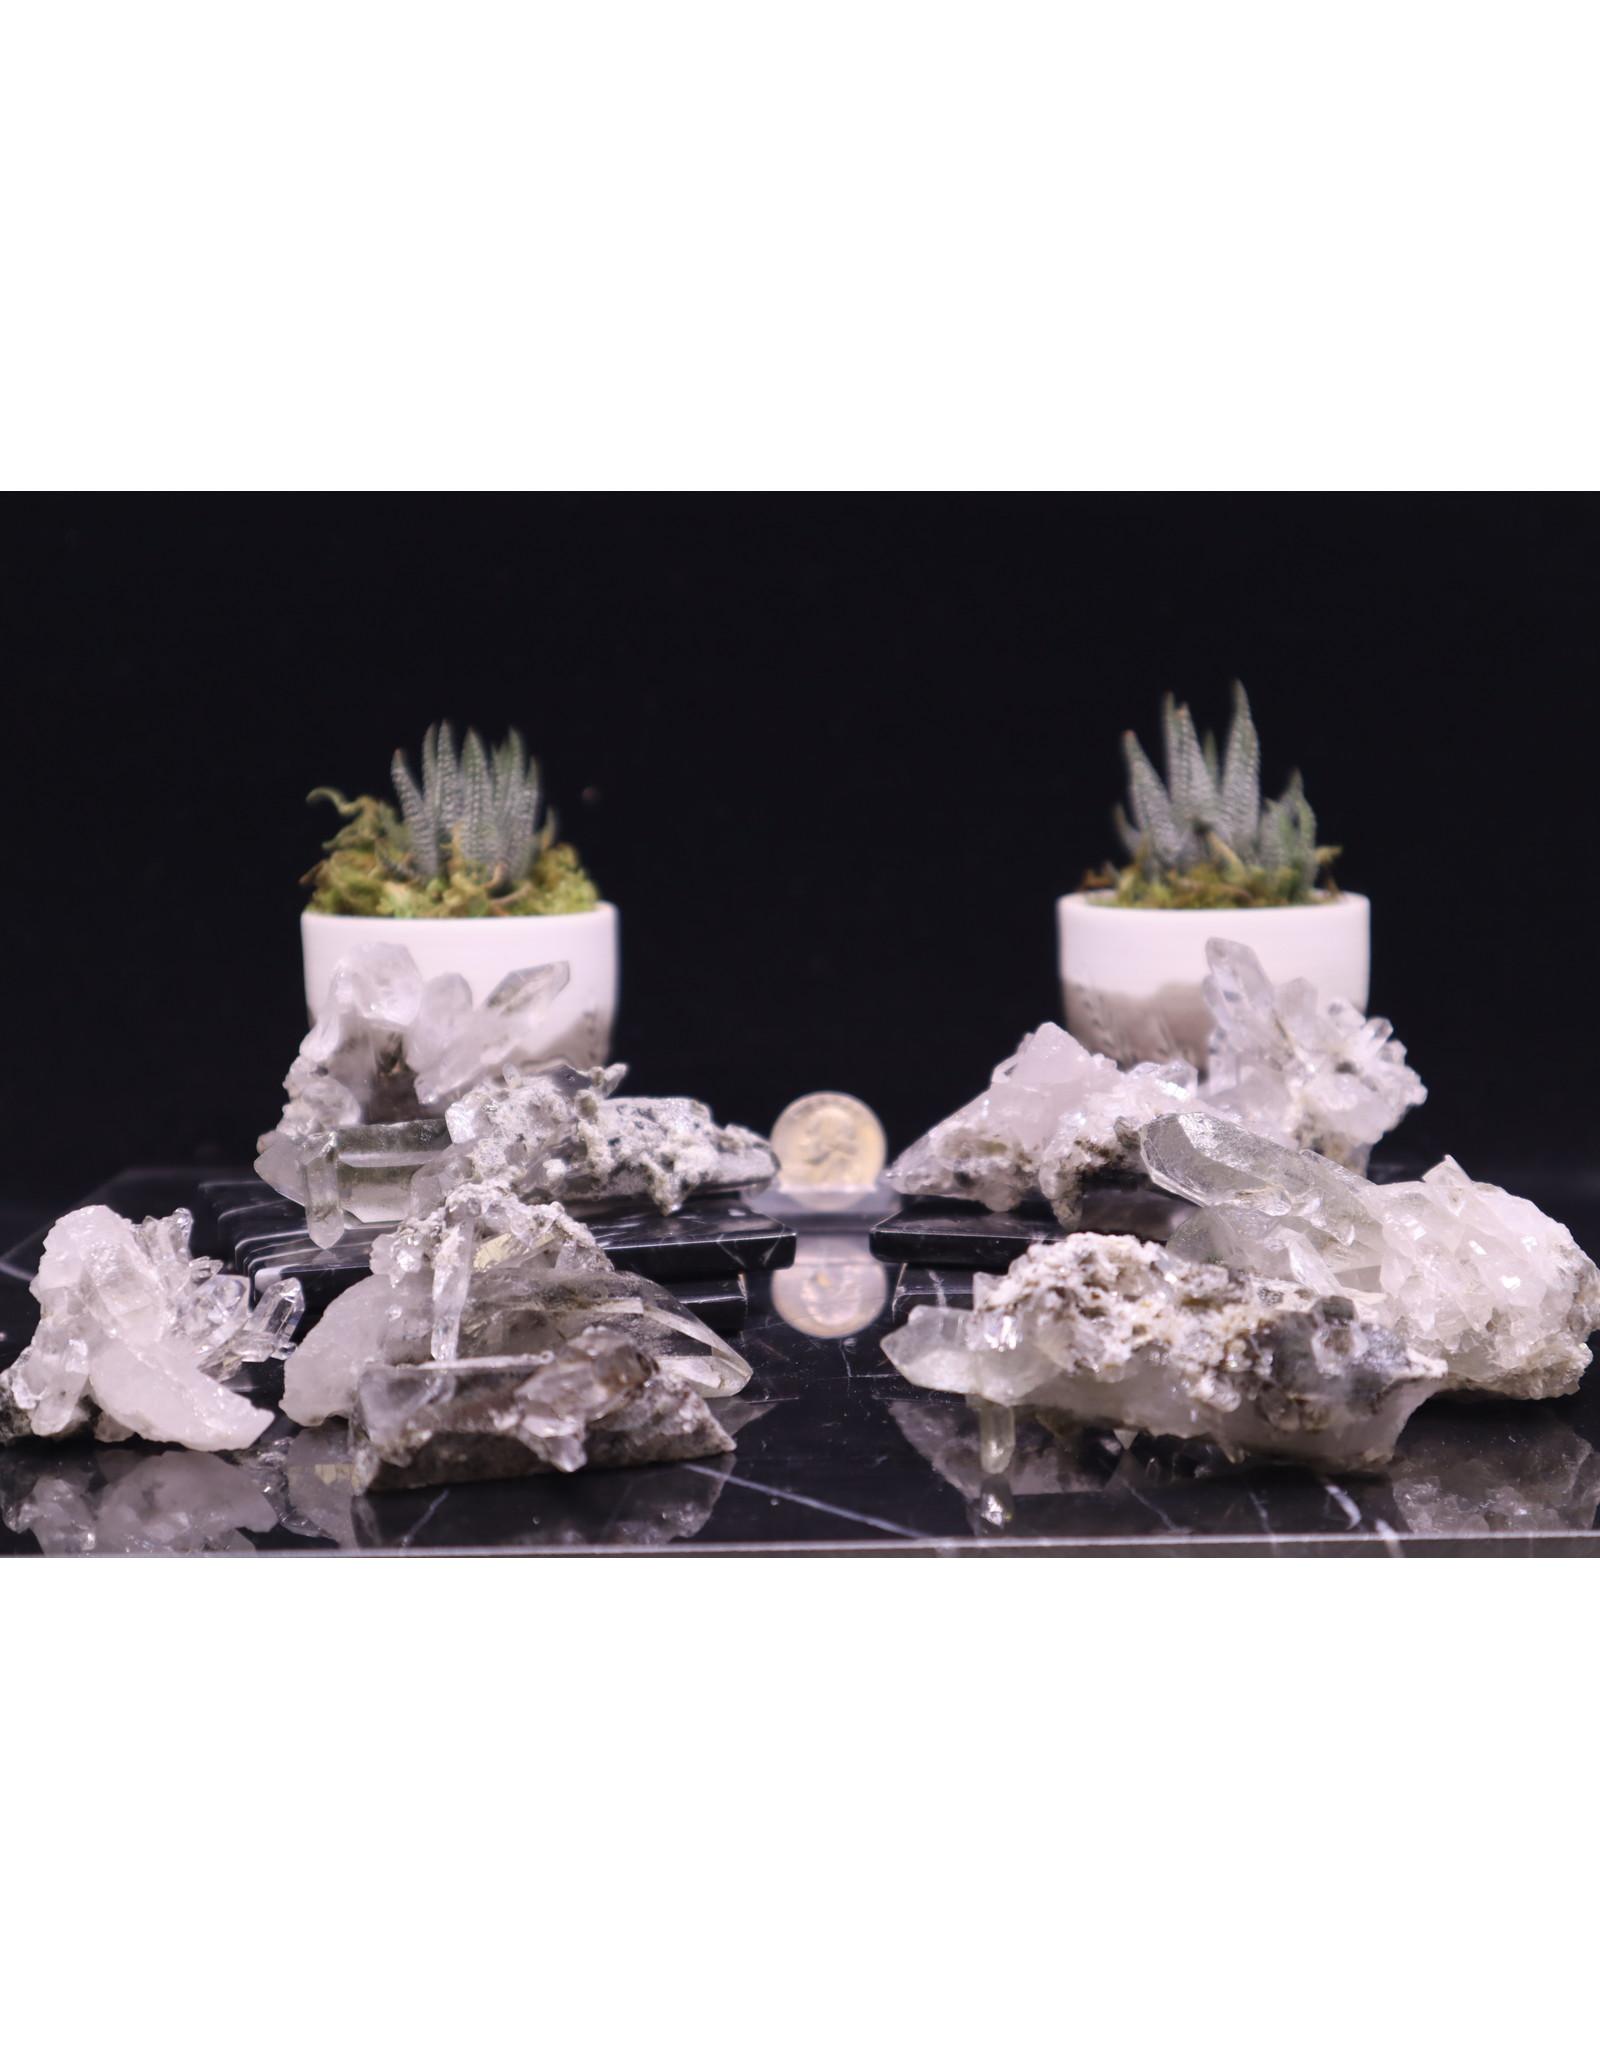 Chlorite Cluster - Large